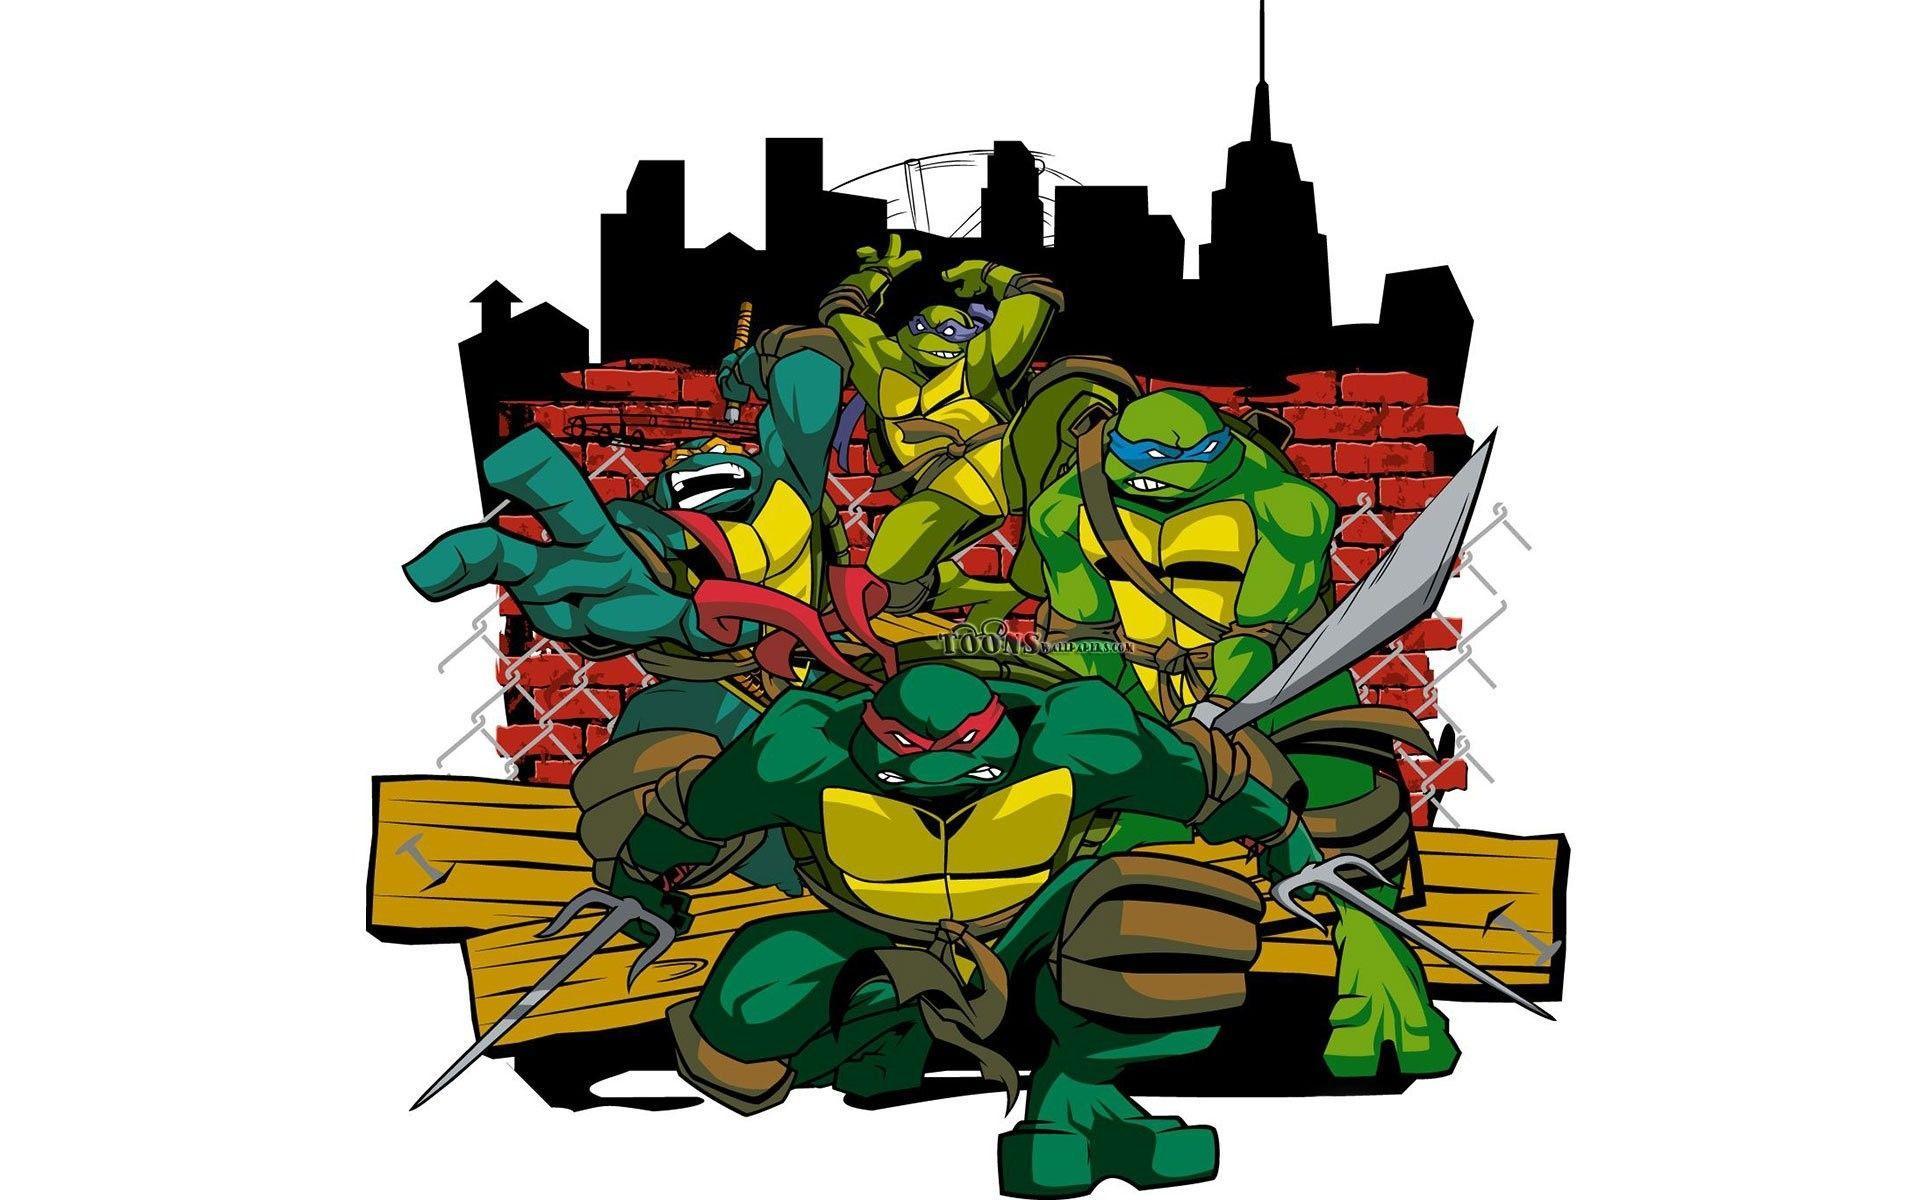 "2880x1800 Teenage Mutant Ninja Turtles Wallpapers | HD Wallpapers | ID #13675"">"